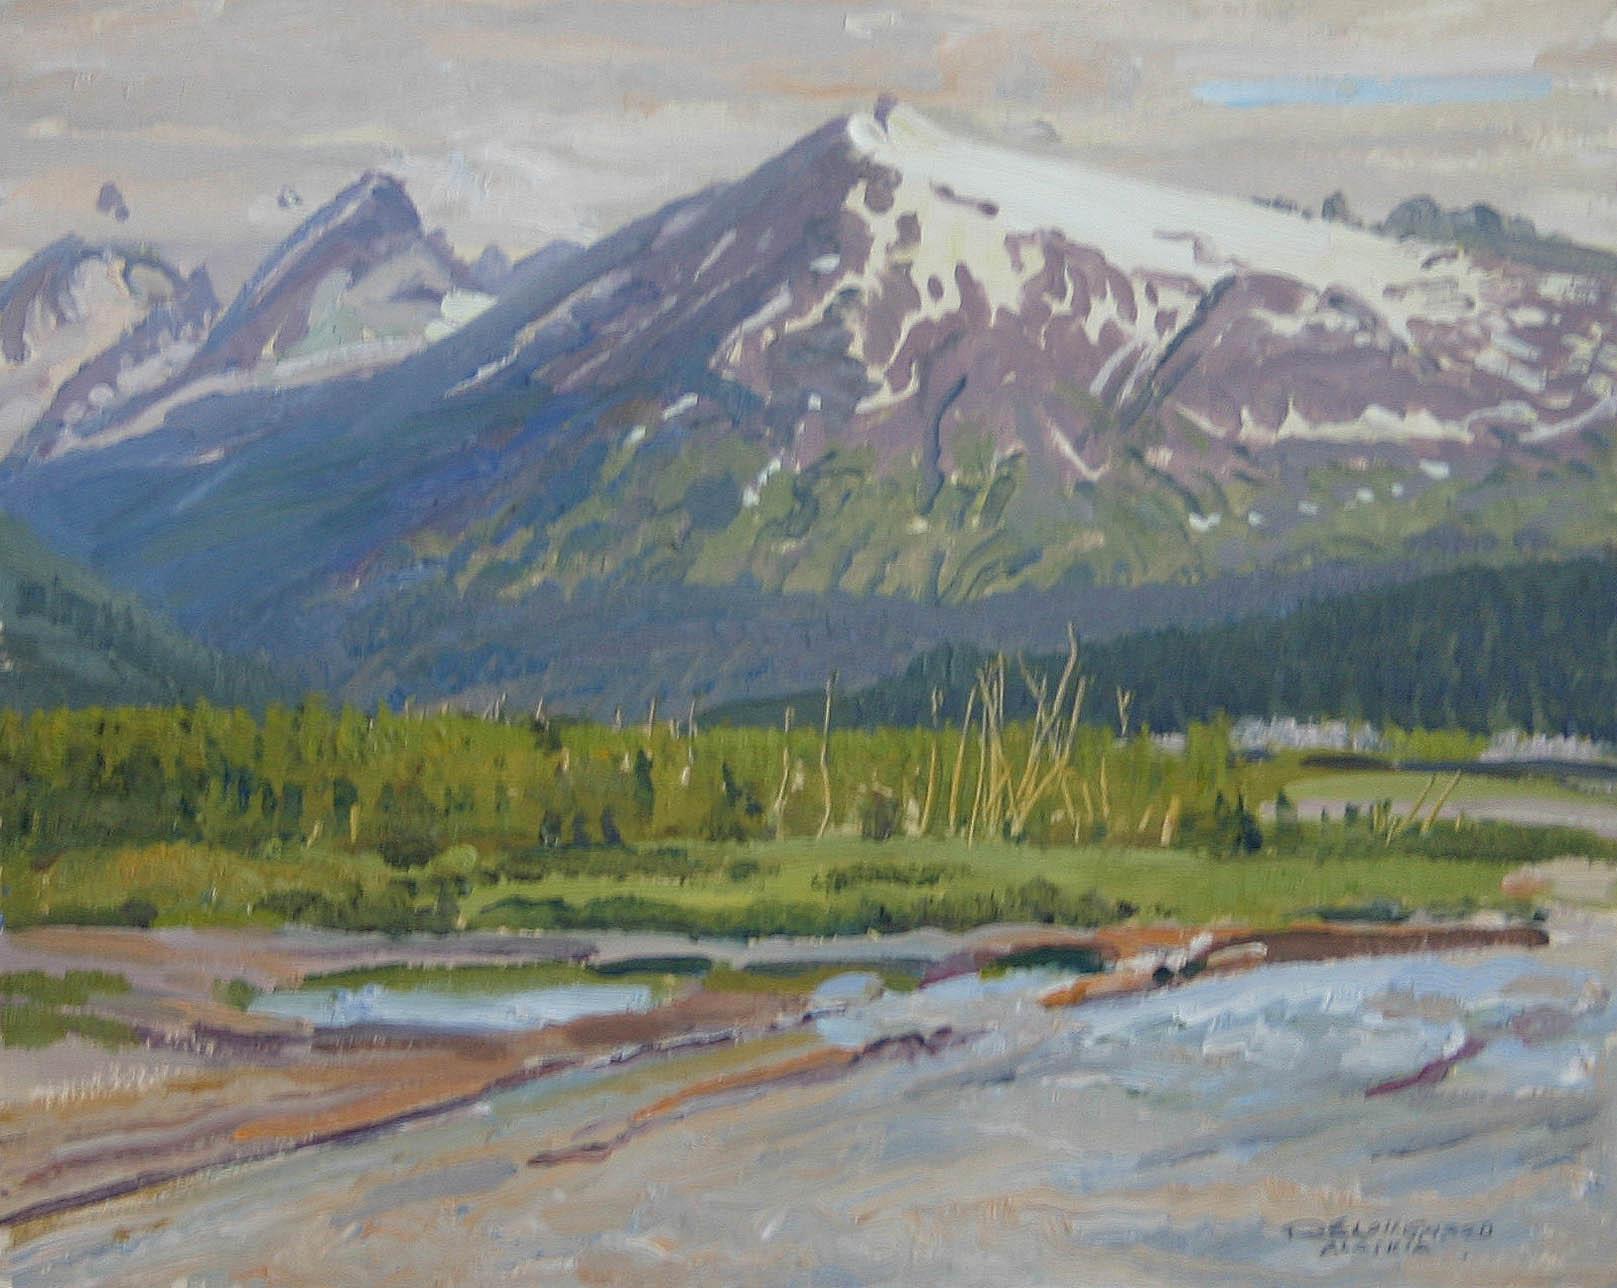 Kenai Peninsula - Sno... by  Robert Lougheed - Masterpiece Online